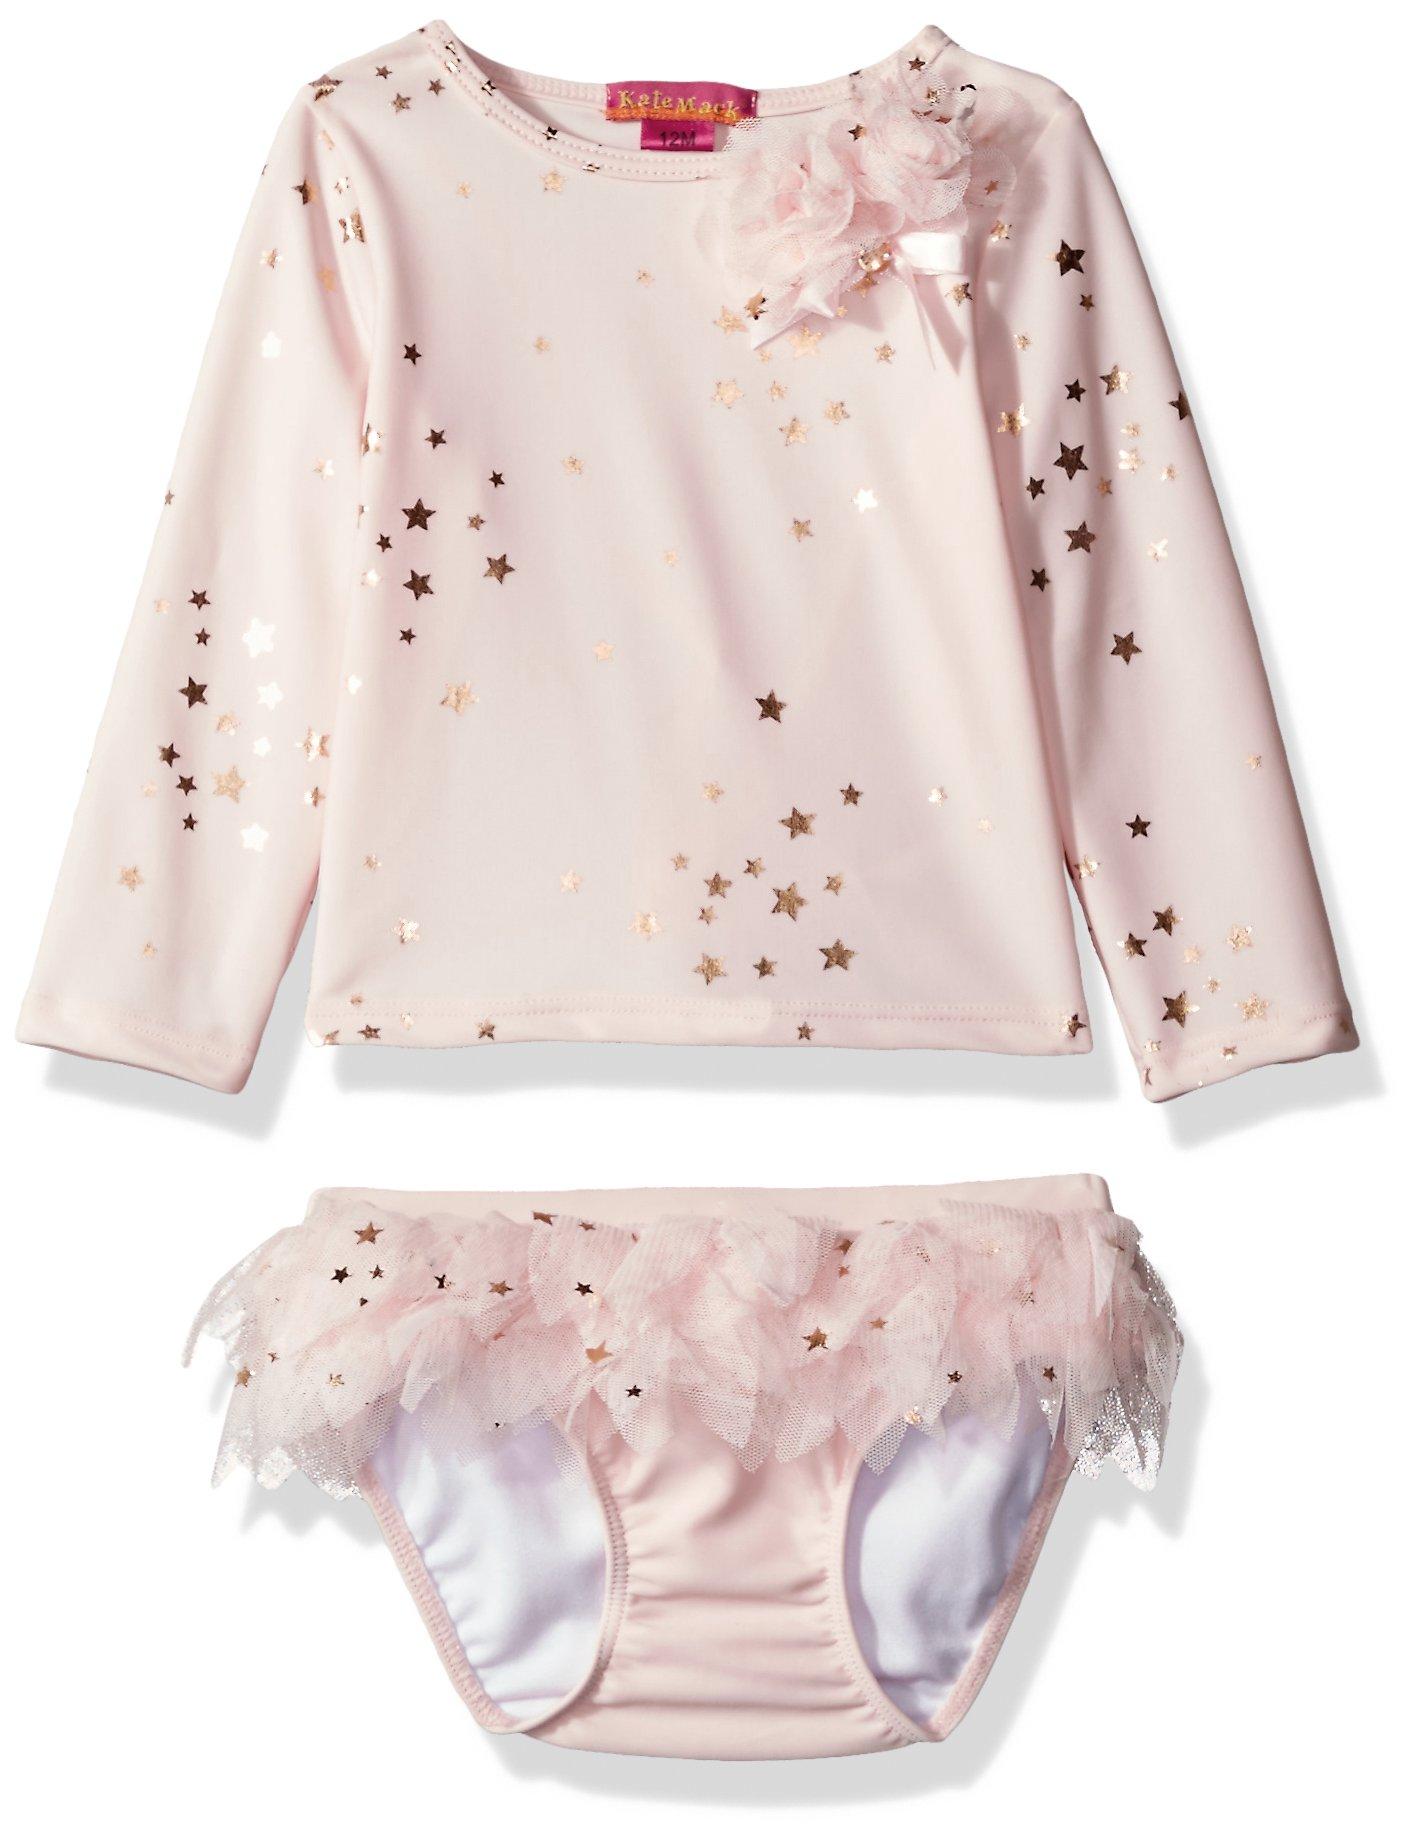 Kate Mack Baby Girls' Fairy Dance Rashguard and Skirted Swim Bottom, Pink, 9 Months by Kate Mack